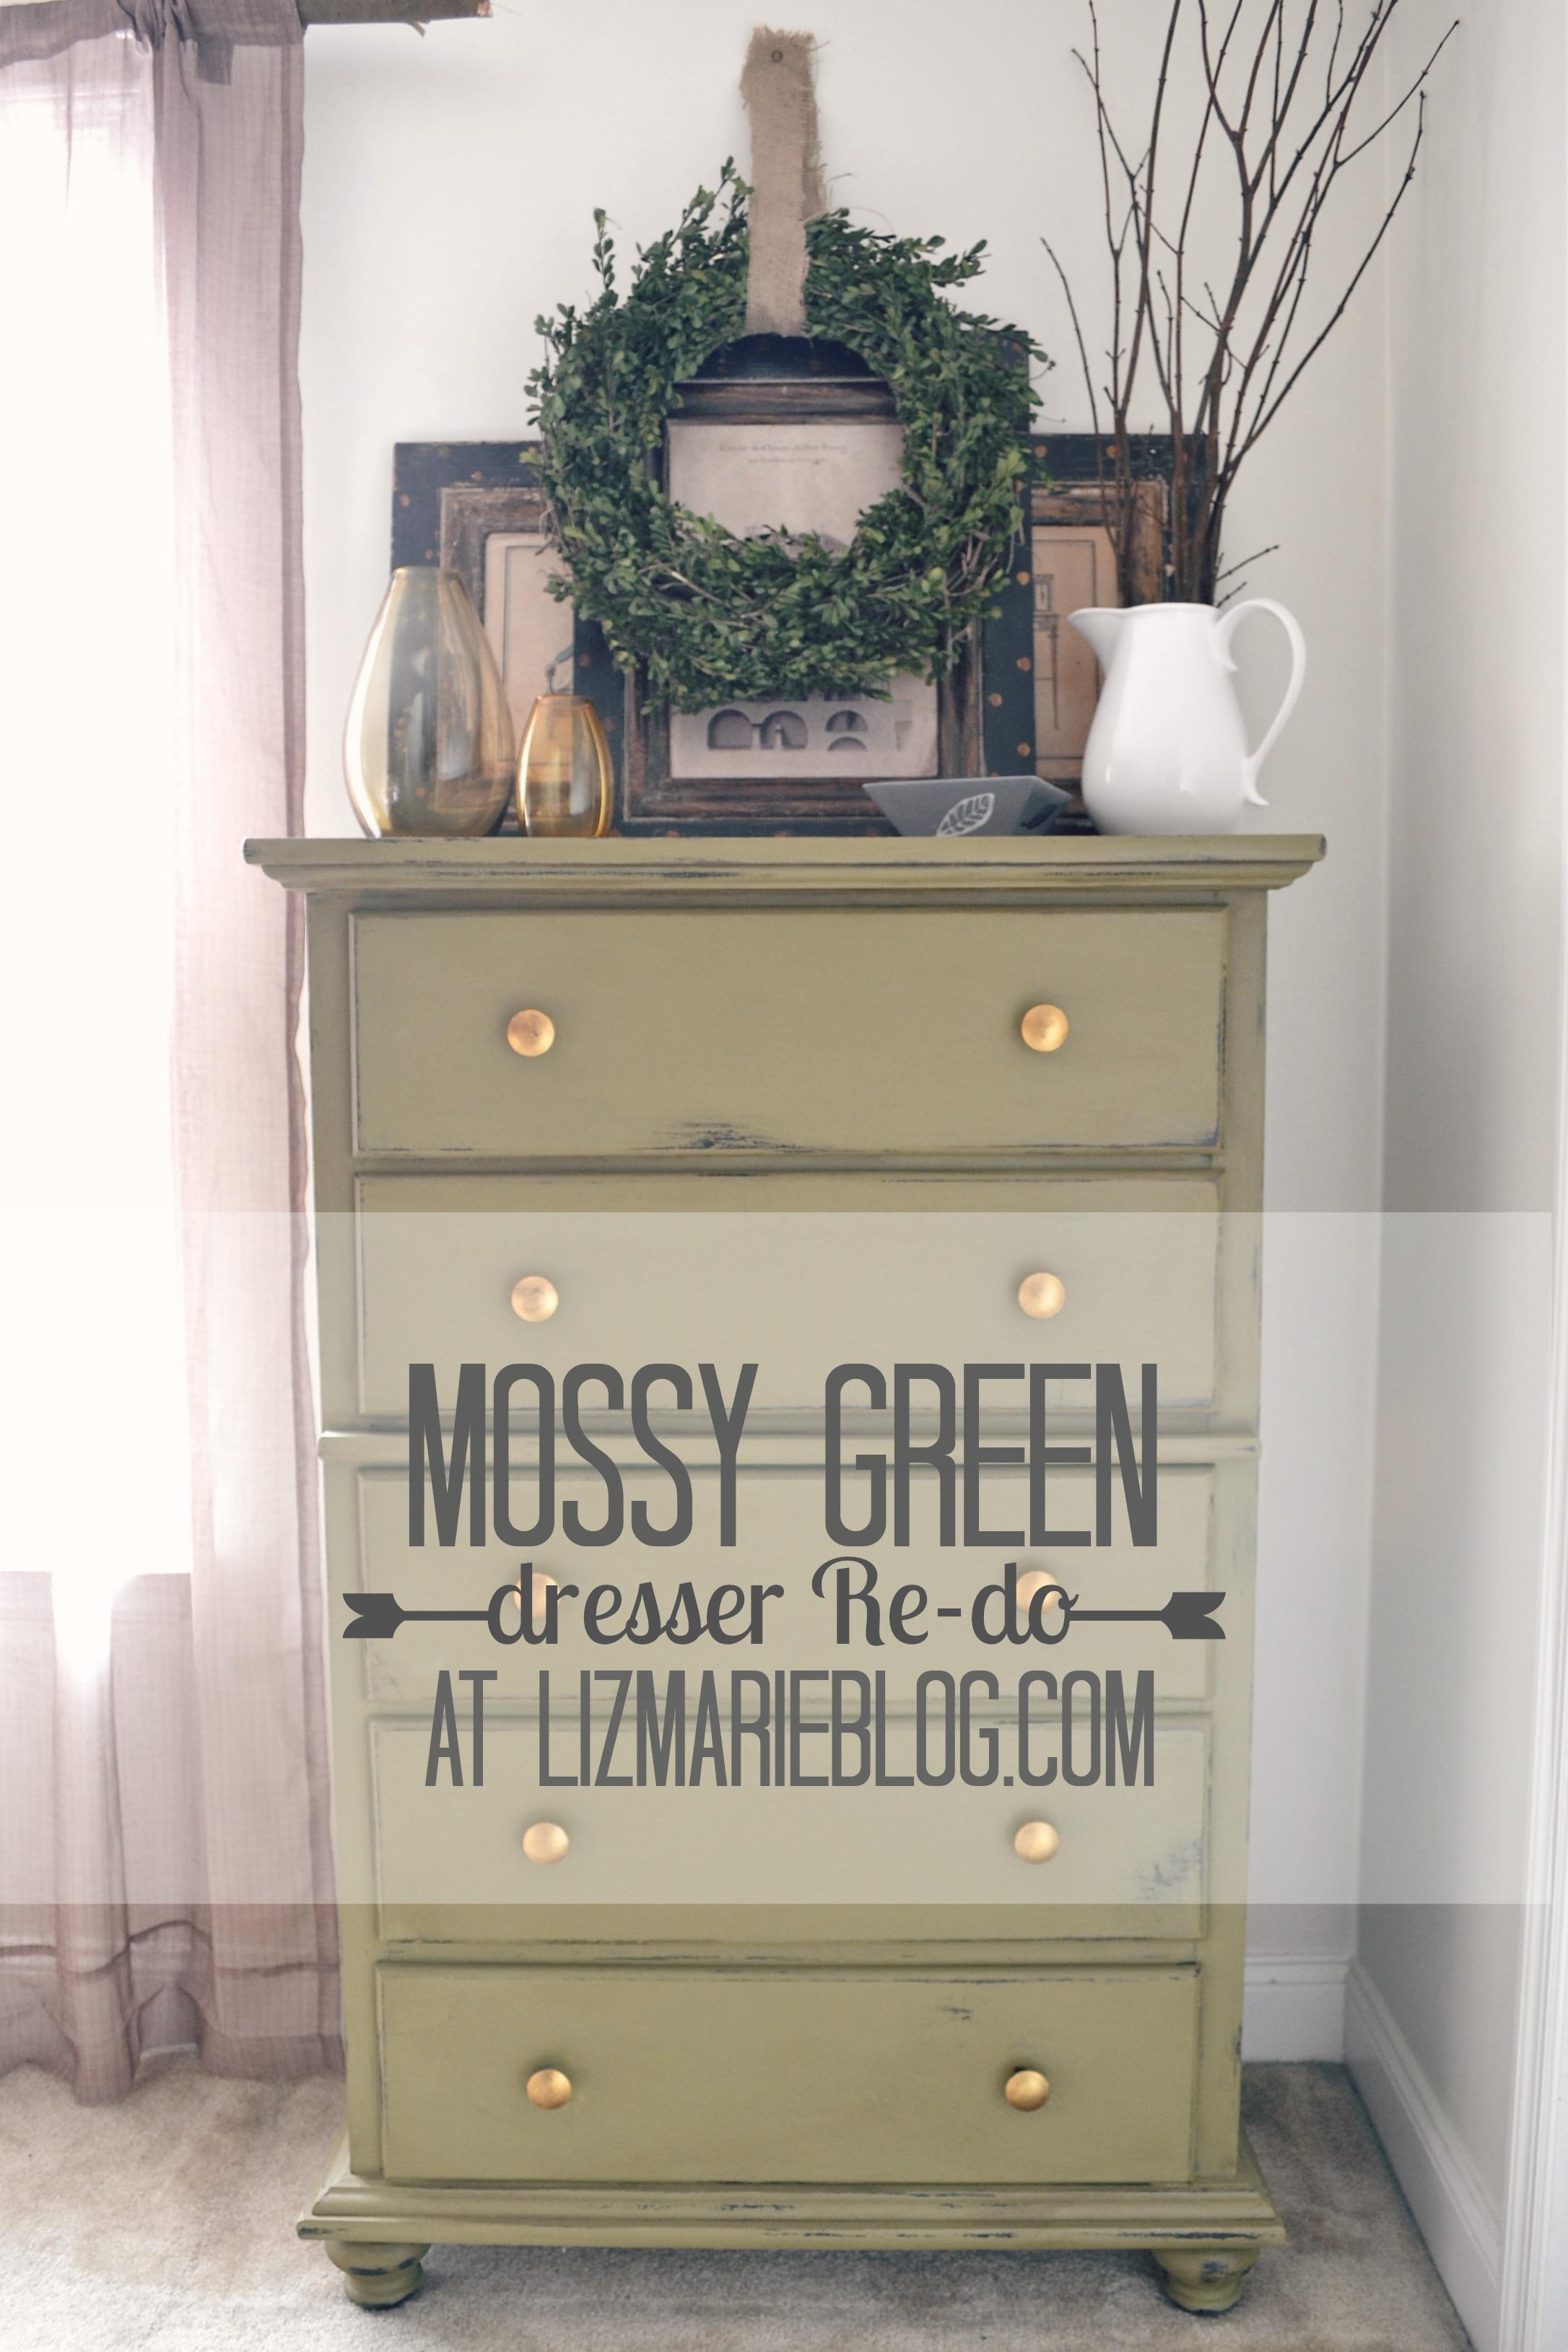 Mossy Green Dresser Re-do